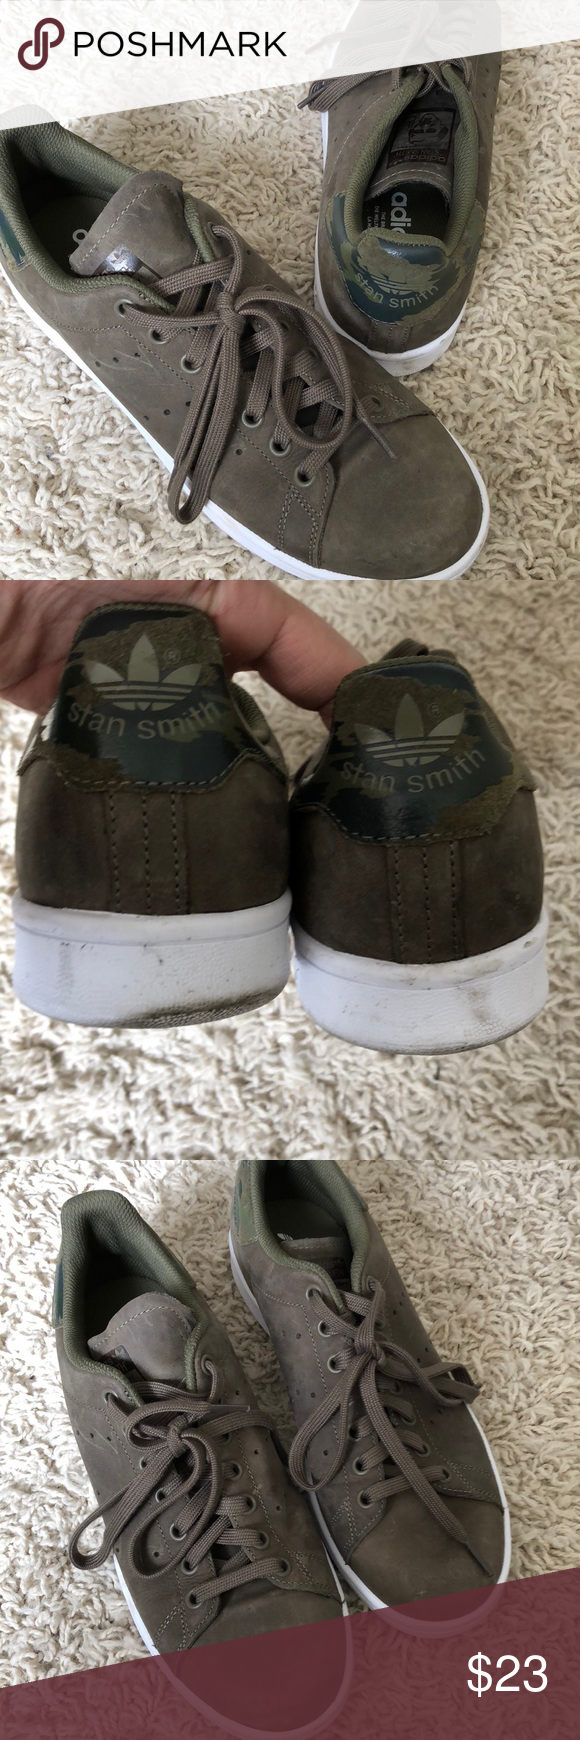 Adidas Zapatillas adidas Stan Smith zapatillas, Stan Smith zapatillas